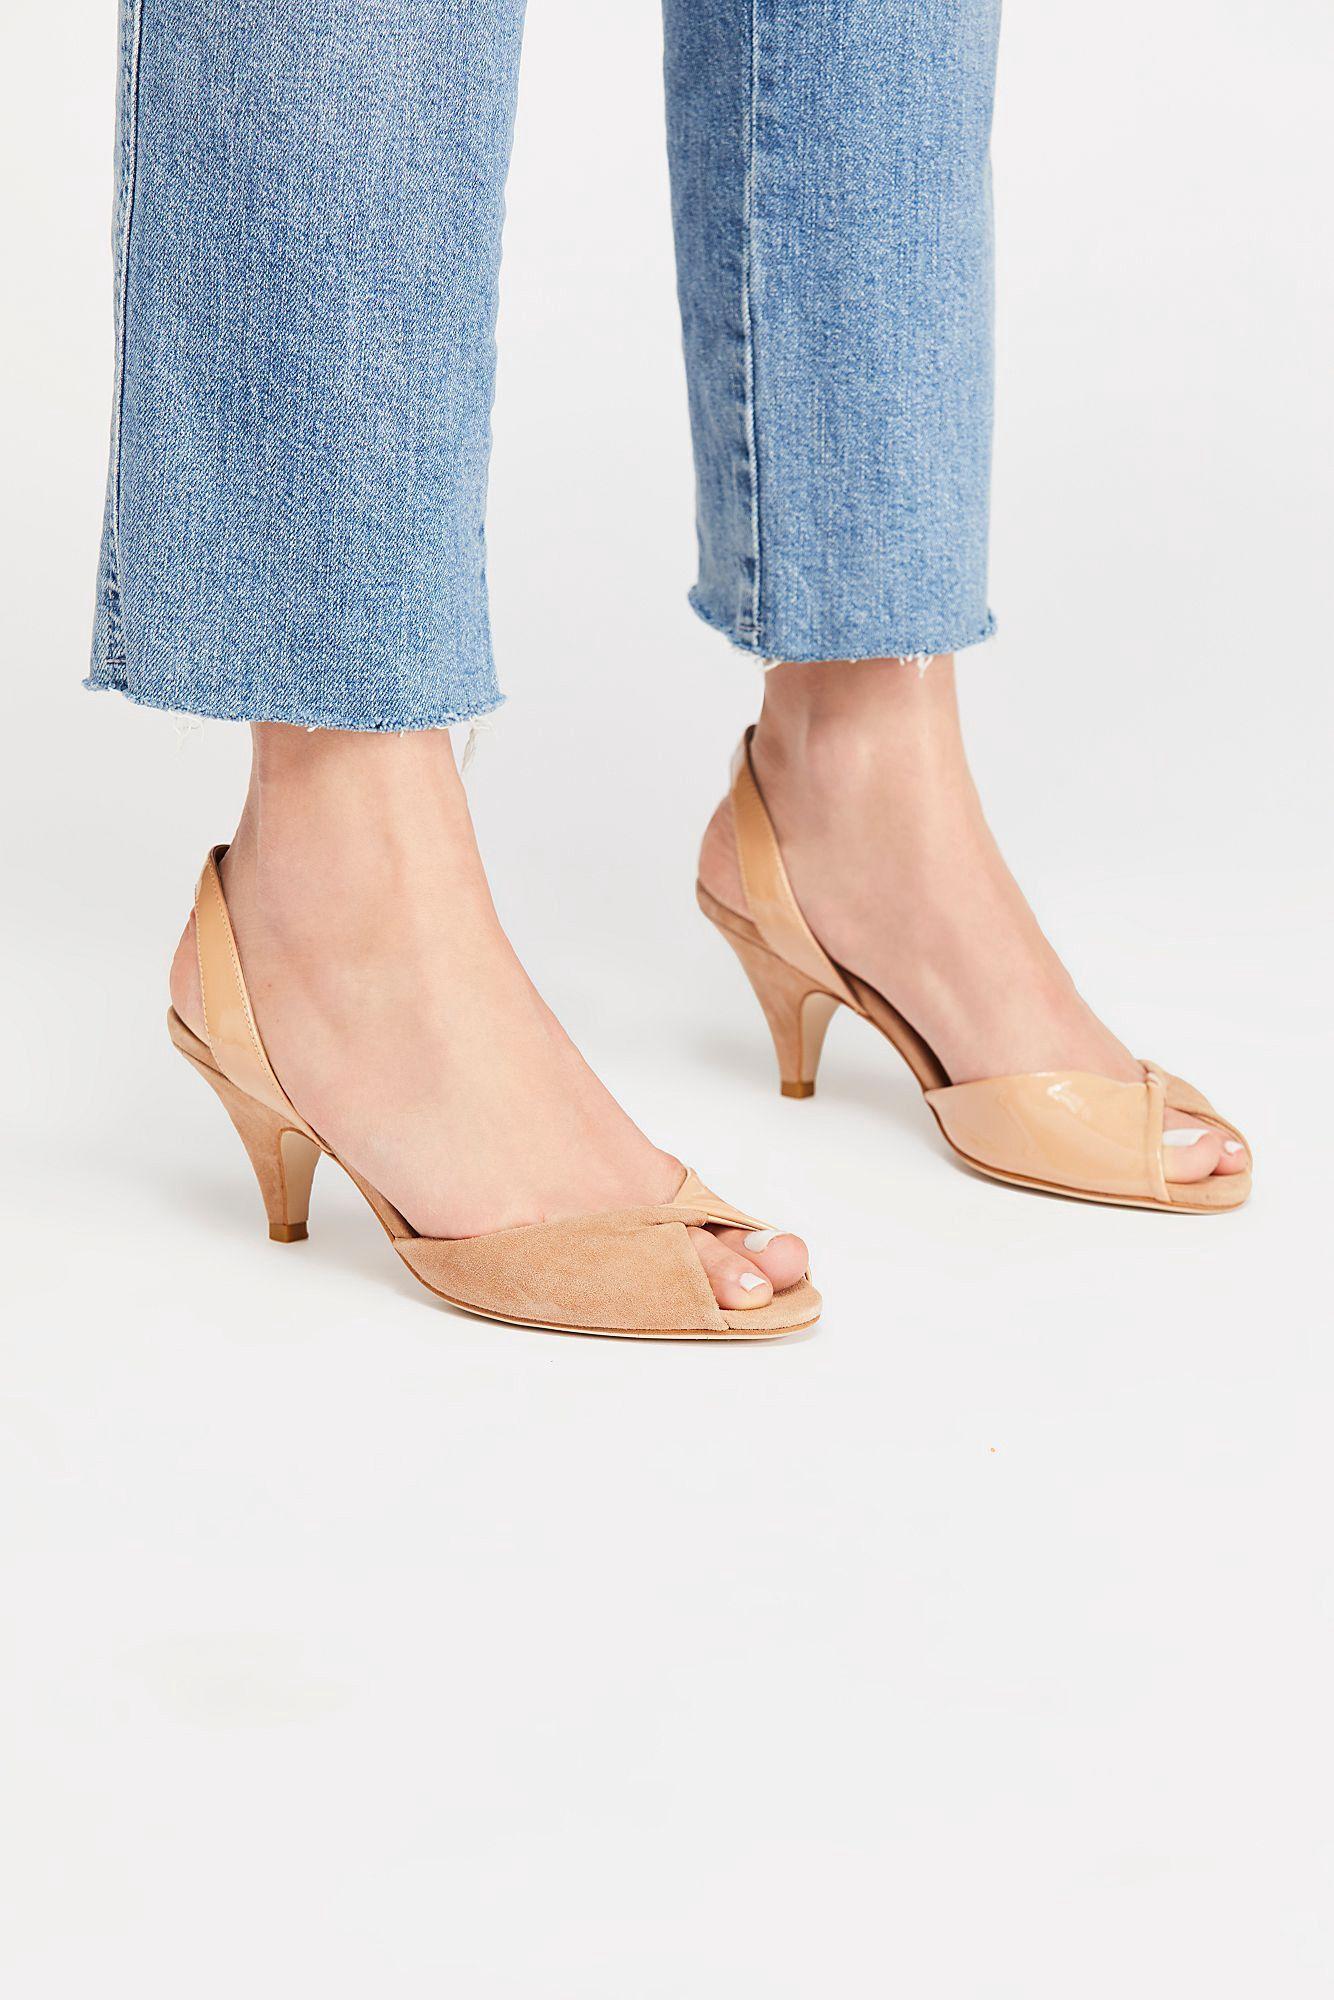 Free People Jaimie Kitten Heel Silver Gold Combo 6 5 Strap Heels Ankle Strap Heels Heels